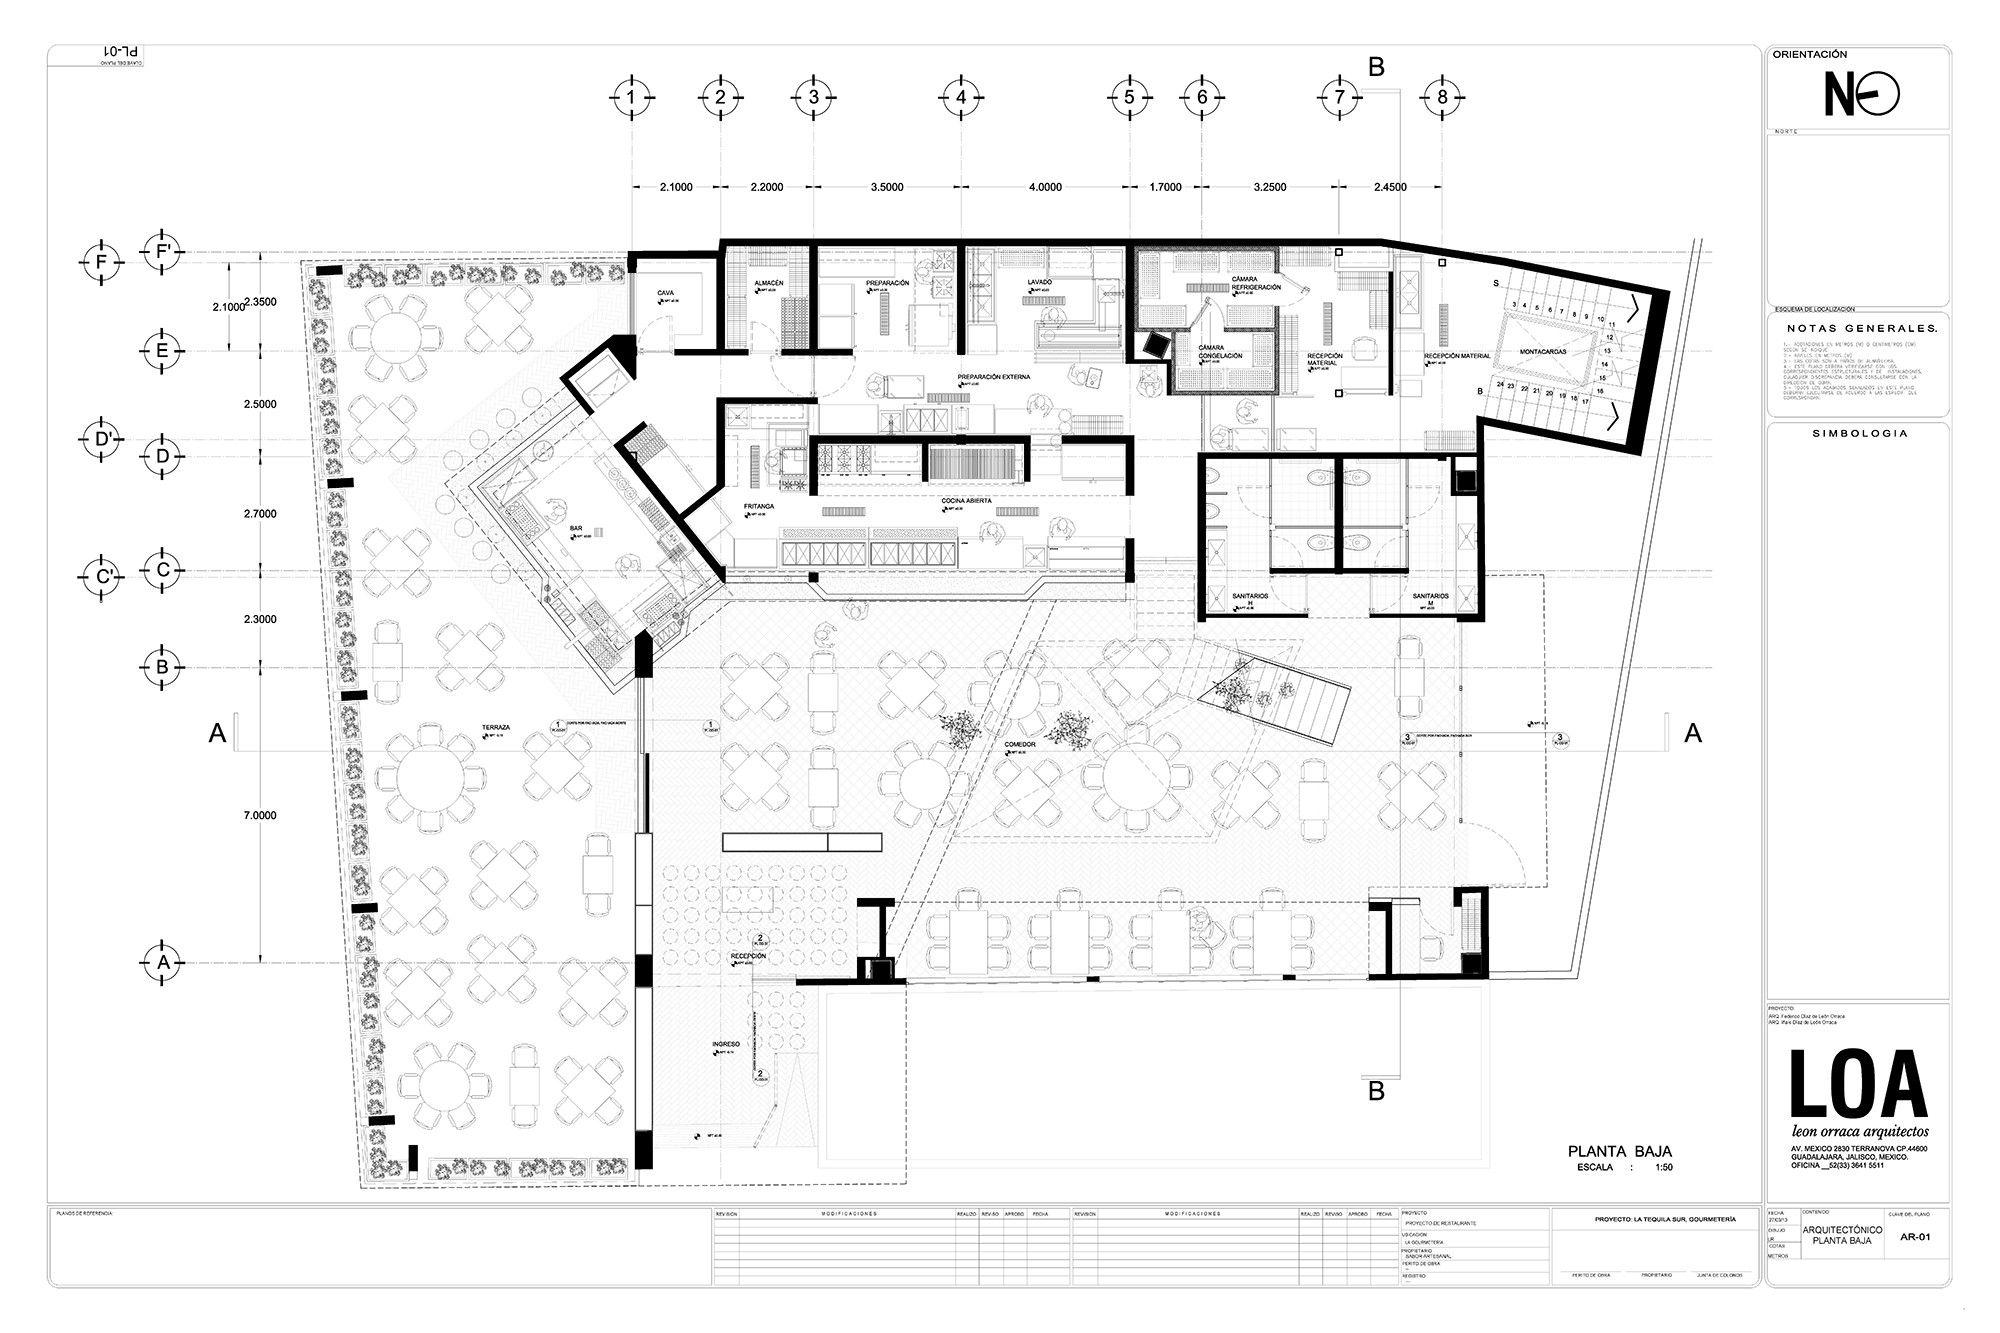 Galeria de restaurante la tequila sur loa 13 for Programa arquitectonico restaurante